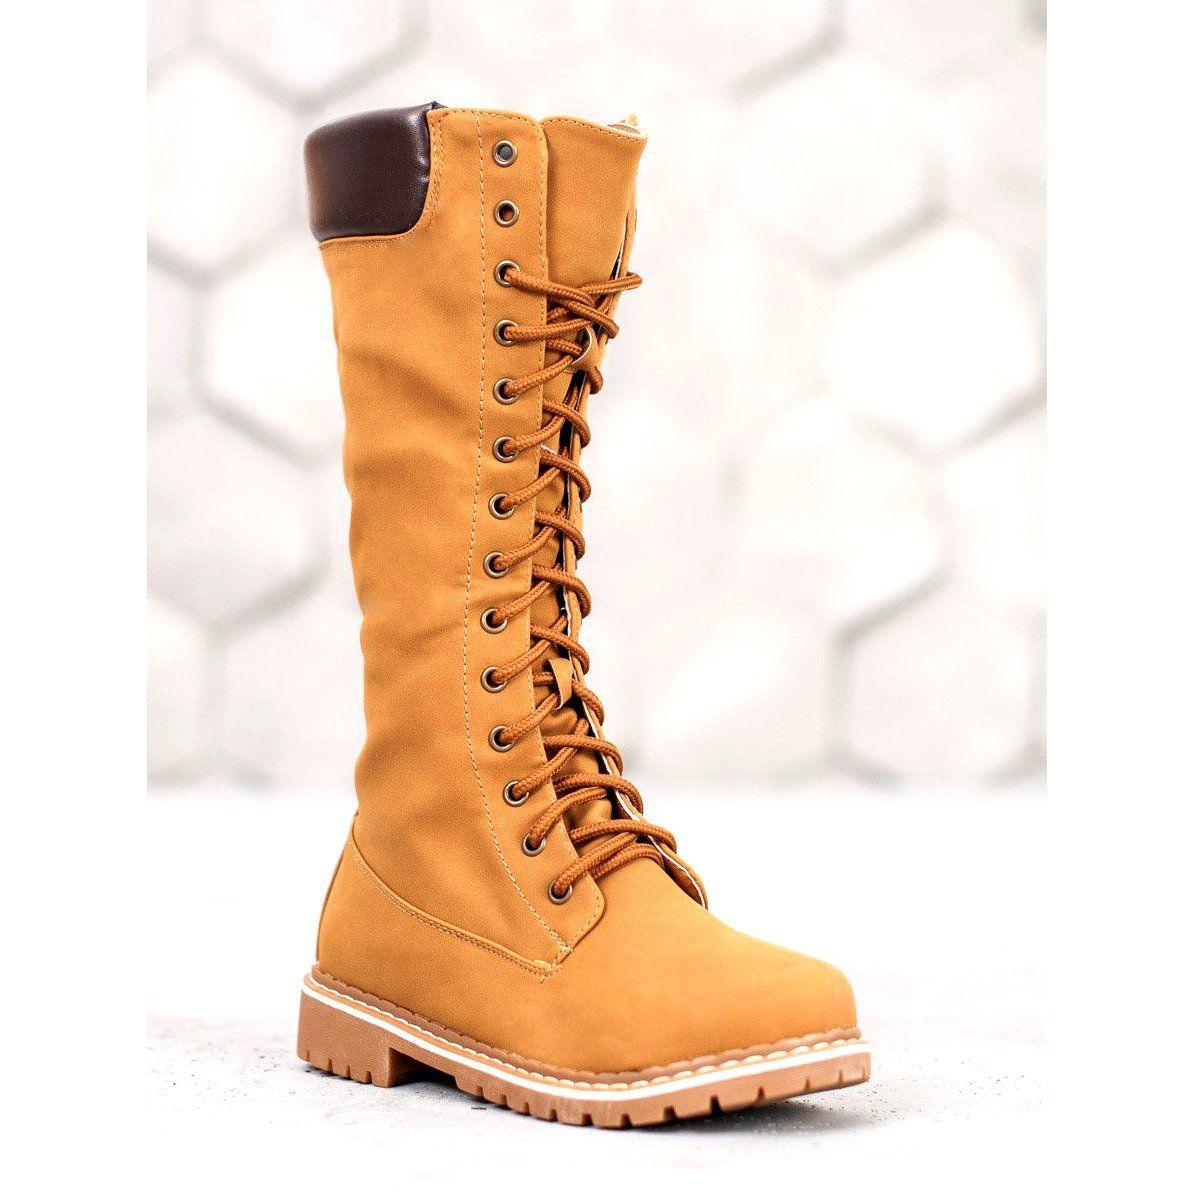 Seastar Cieple Sznurowane Kozaki Brazowe Boots Boot Shoes Women Womens Boots